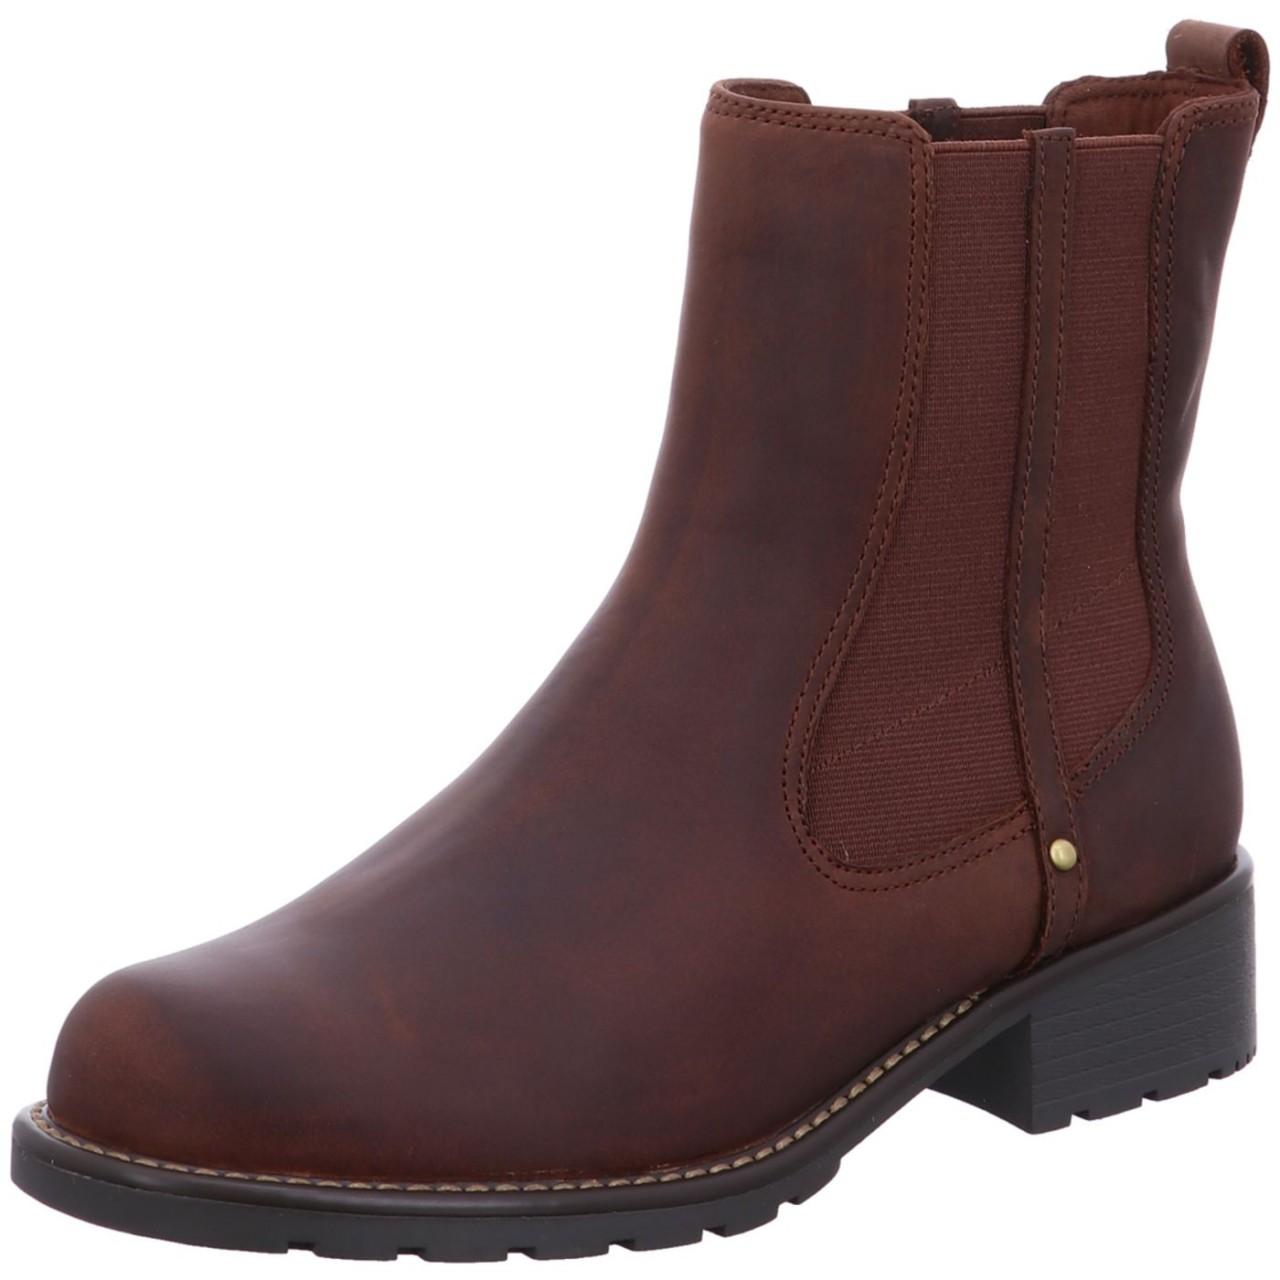 Clarks Boot Orinoco Hot Braun 26138171 Orinoco Hot tan